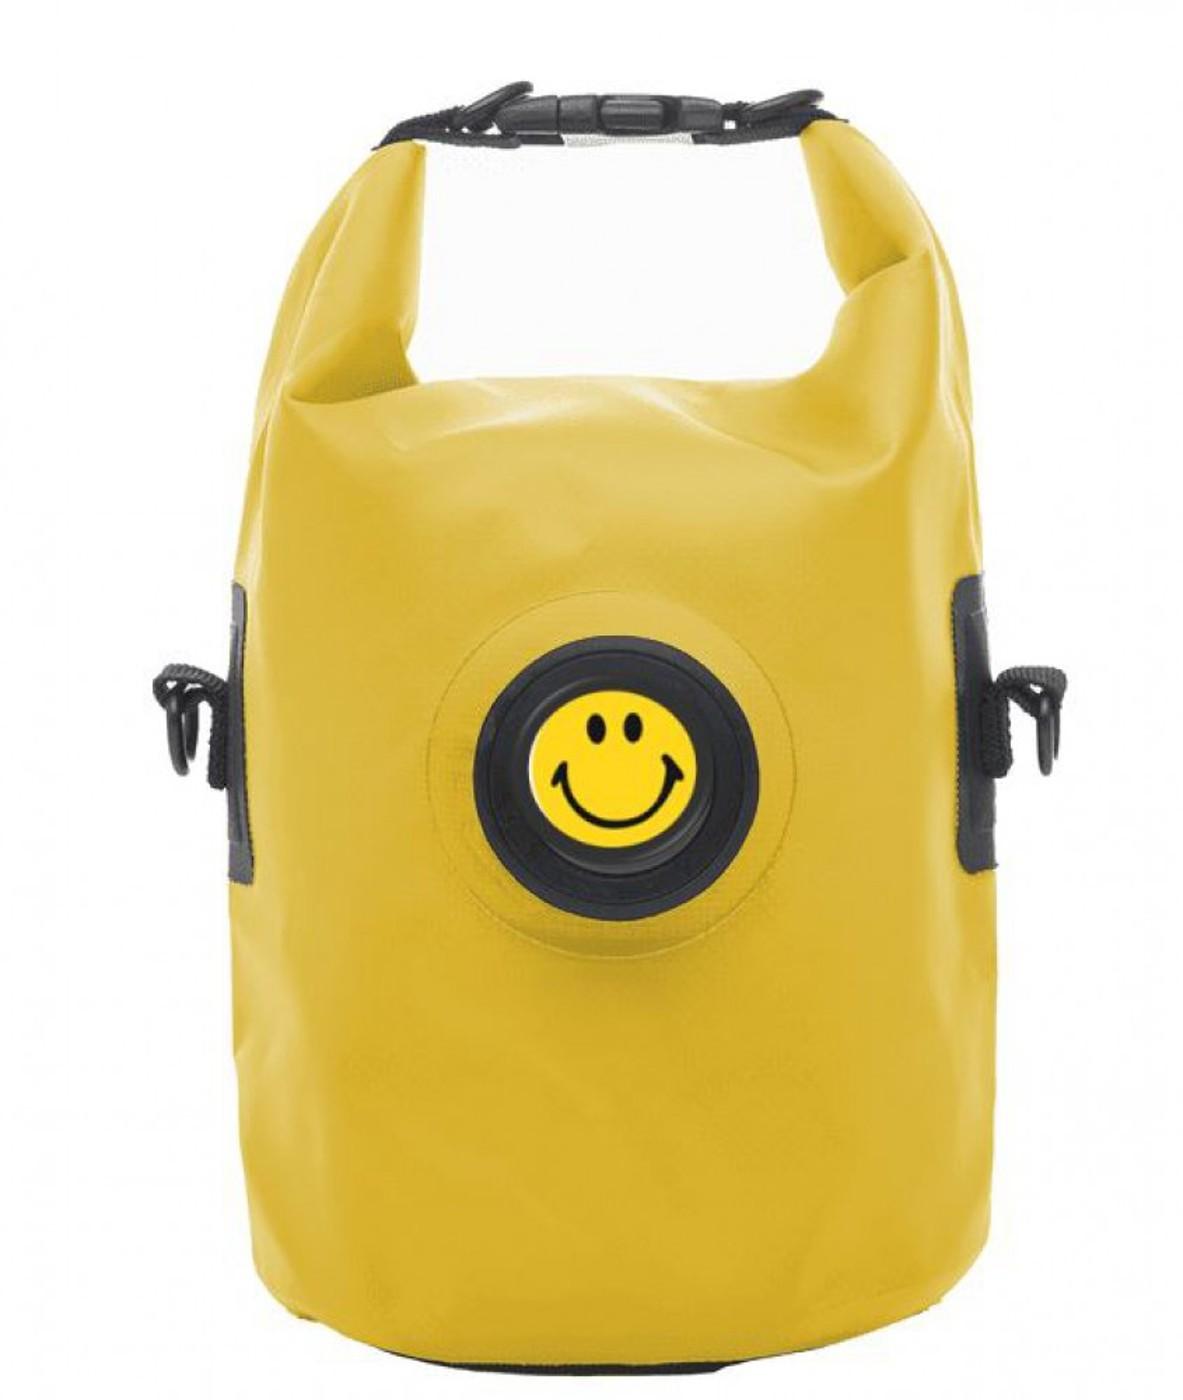 LIGNUM Safebag waterproof